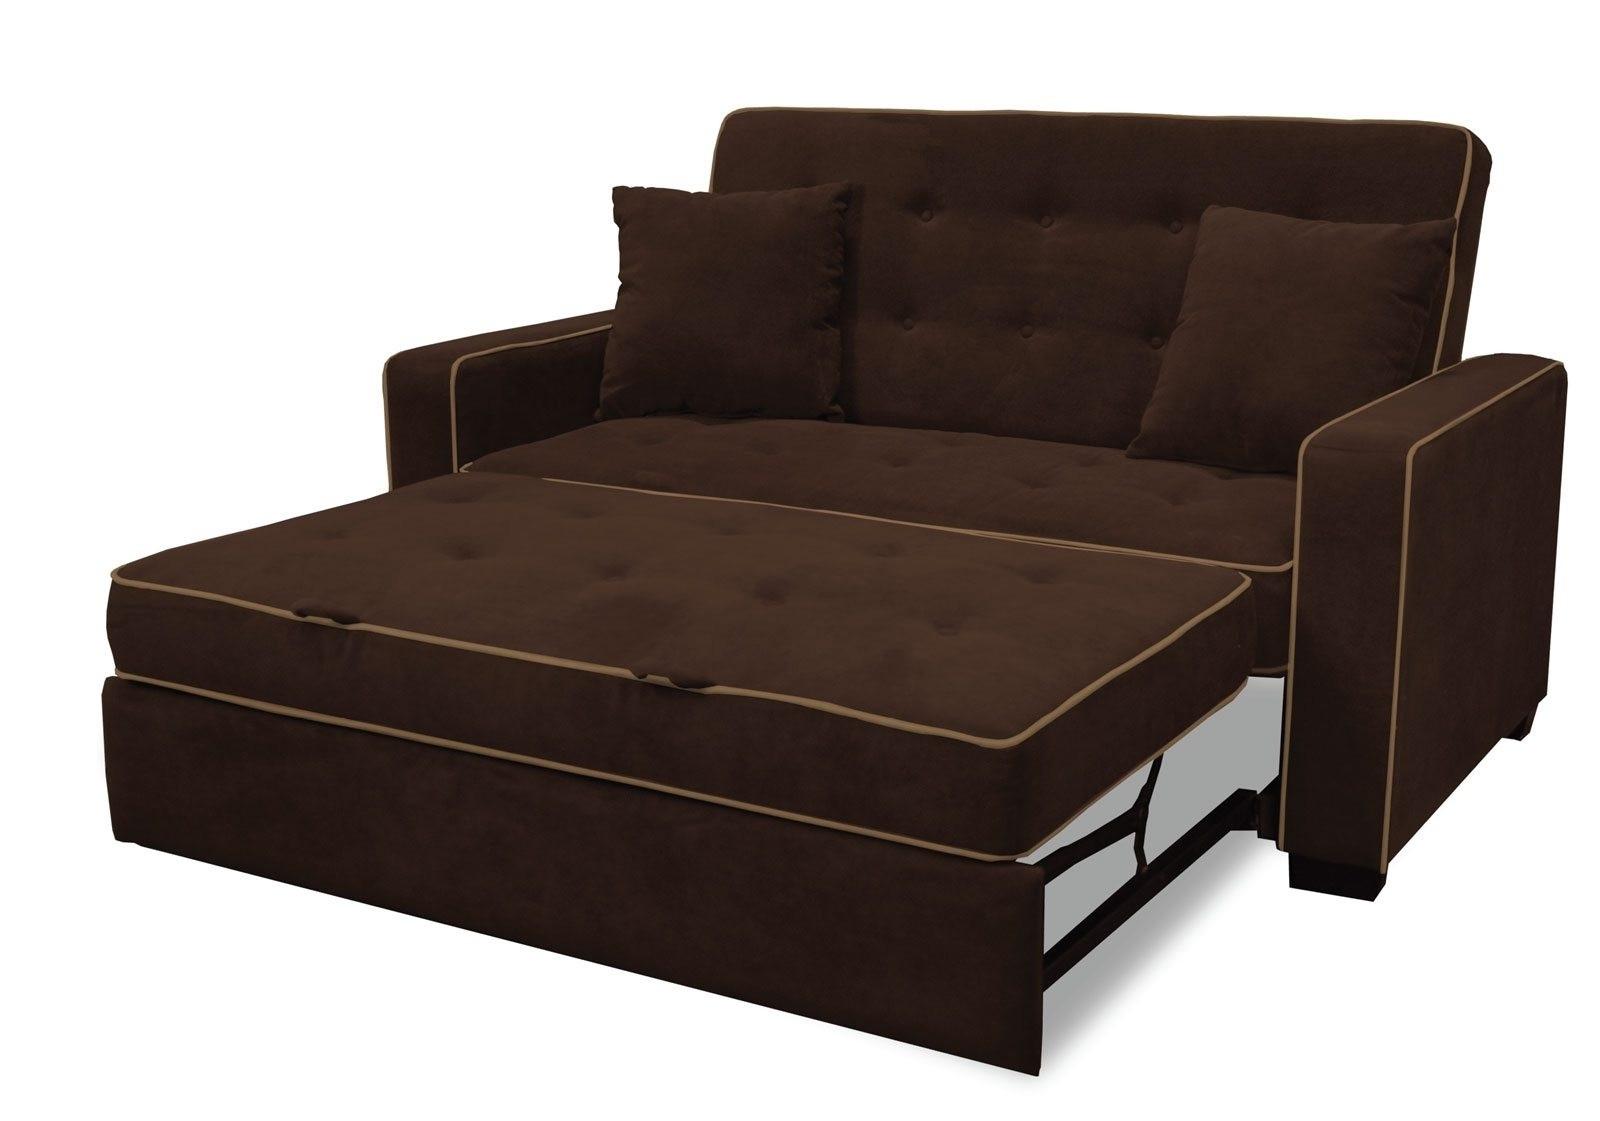 2019 Ikea Loveseat Sleeper Sofas With Elegant Loveseat Sleeper Sofa Ikea Sofas (View 1 of 20)